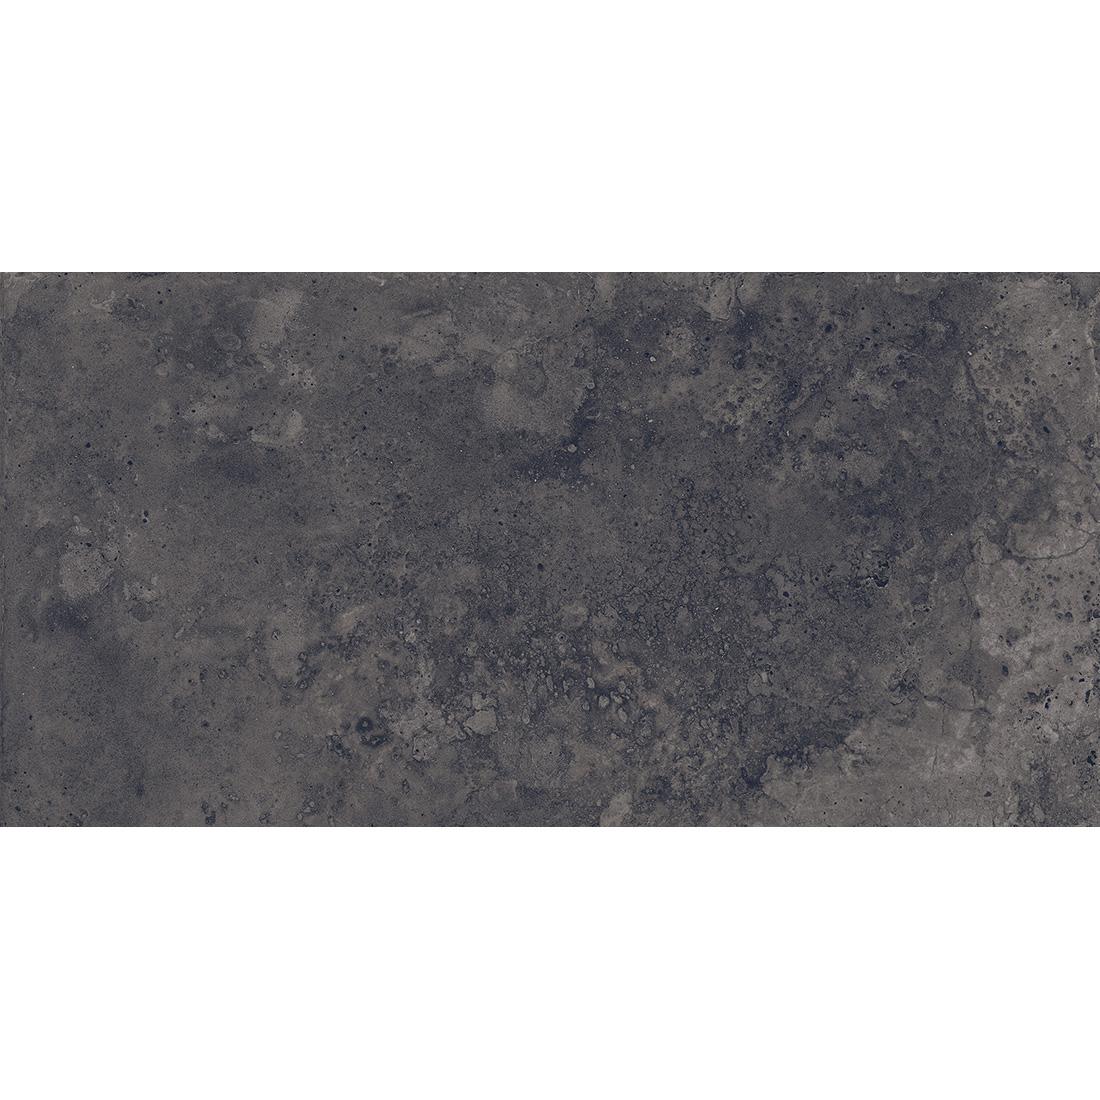 Roma 30x60 Graphite Gloss 1